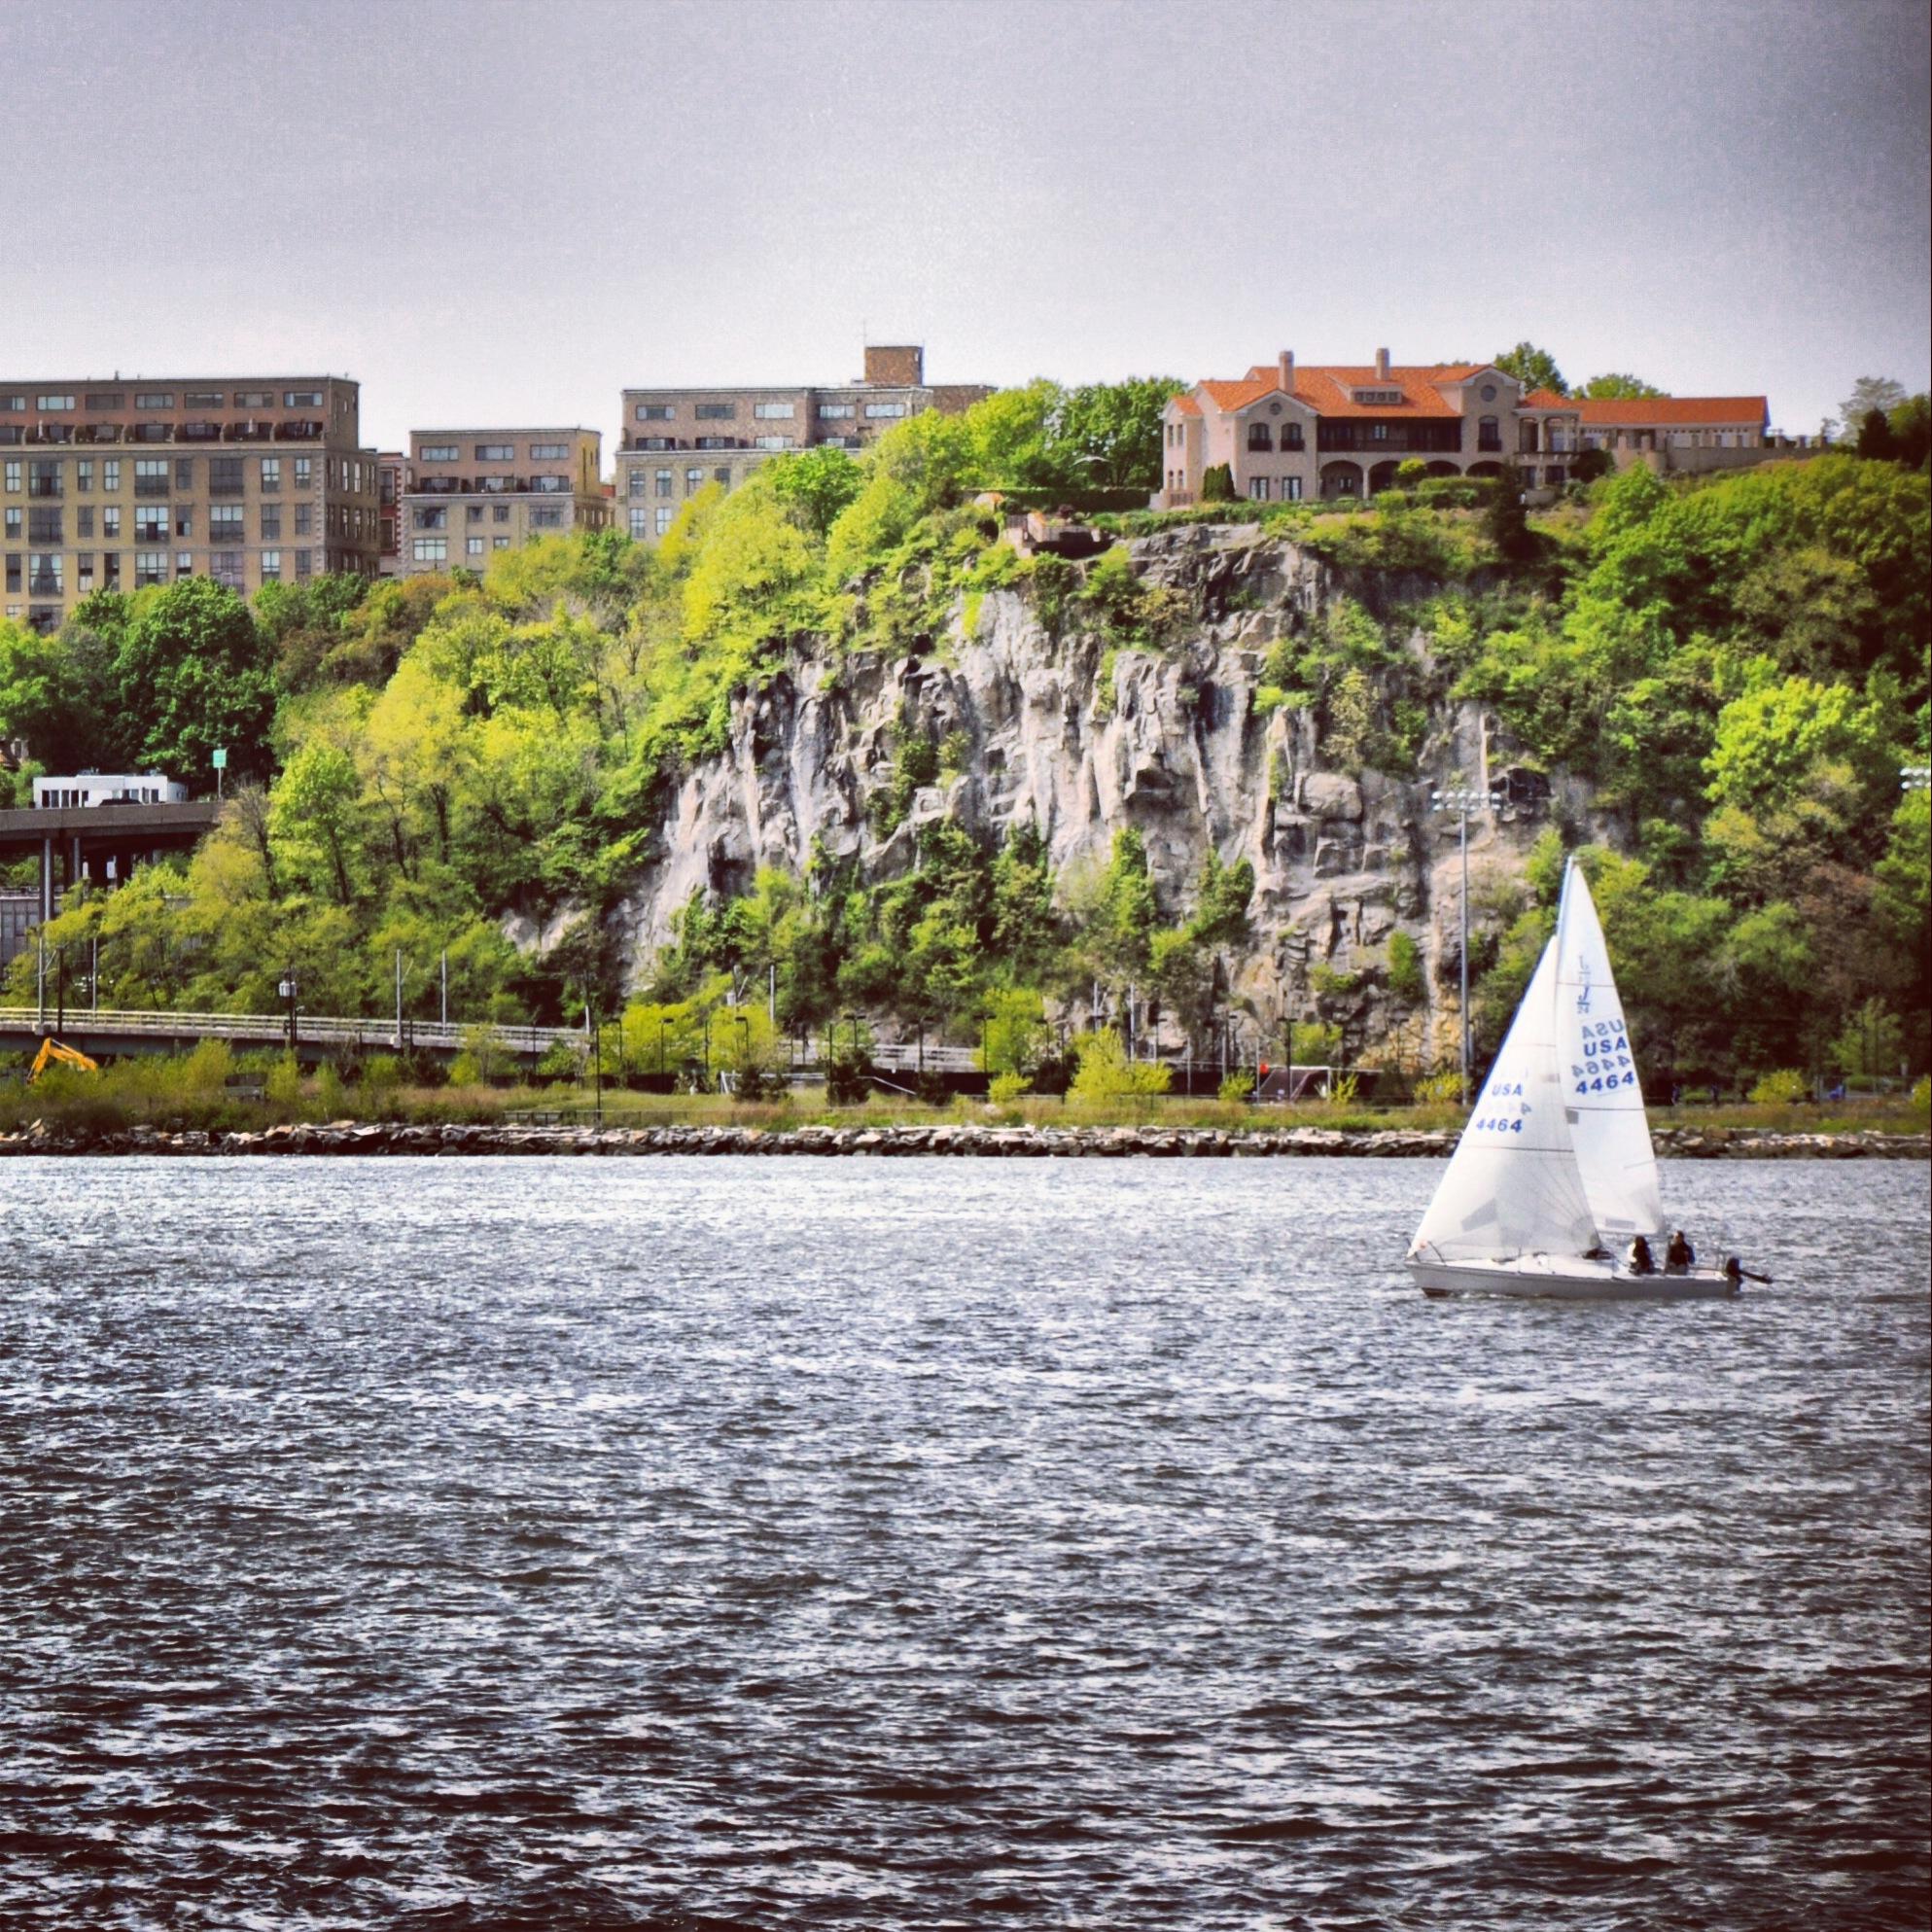 Sailing the Hudson